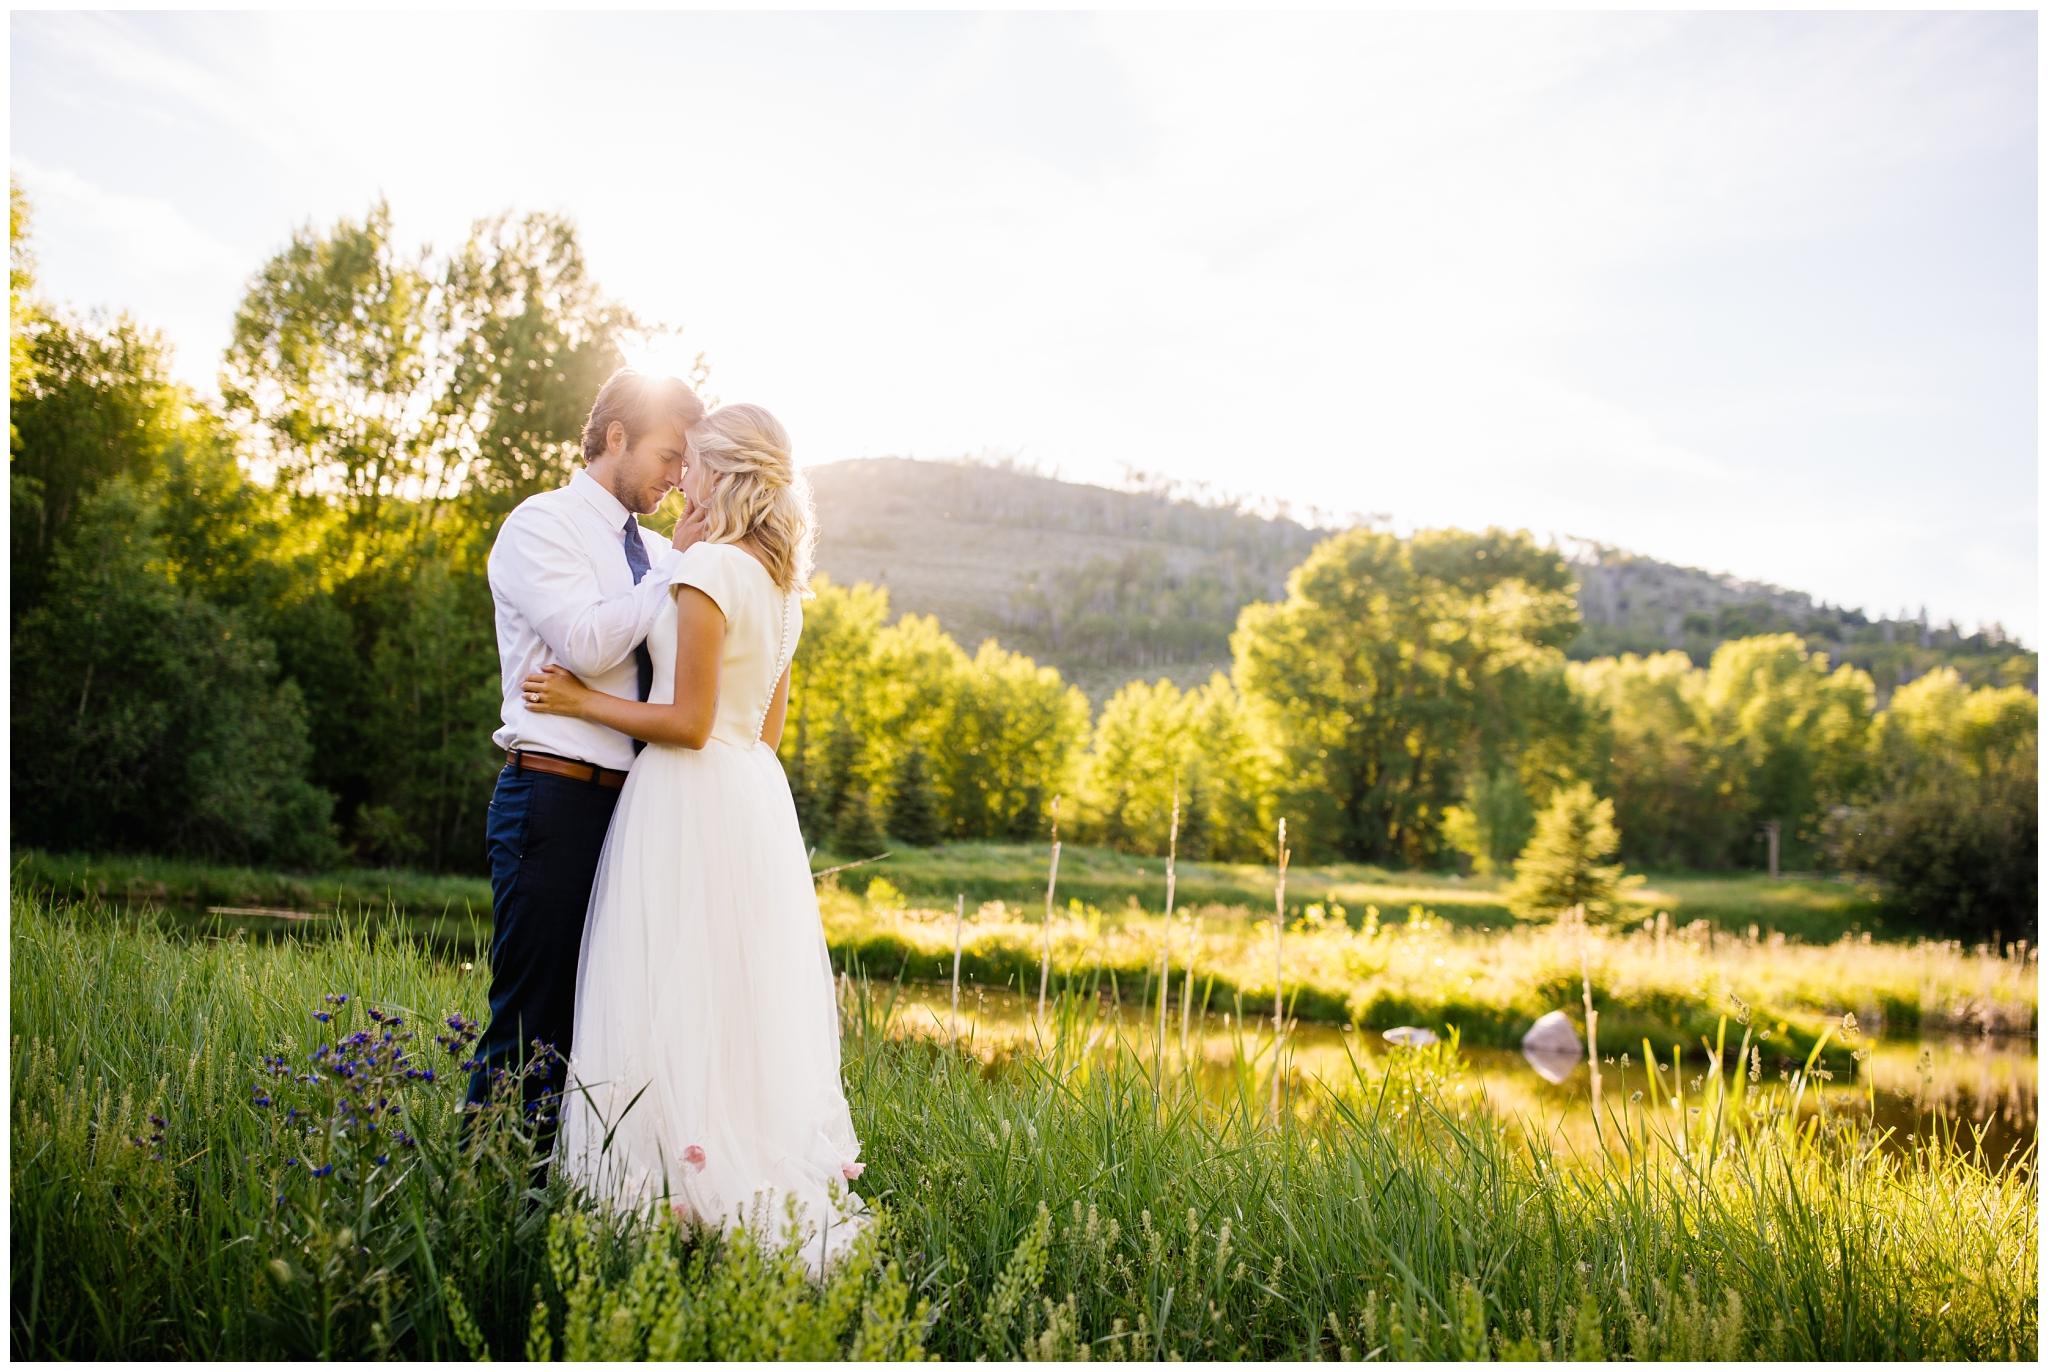 Lizzie-B-Imagery-Utah-Wedding-Photographer-Park-City-Photographer_0040.jpg